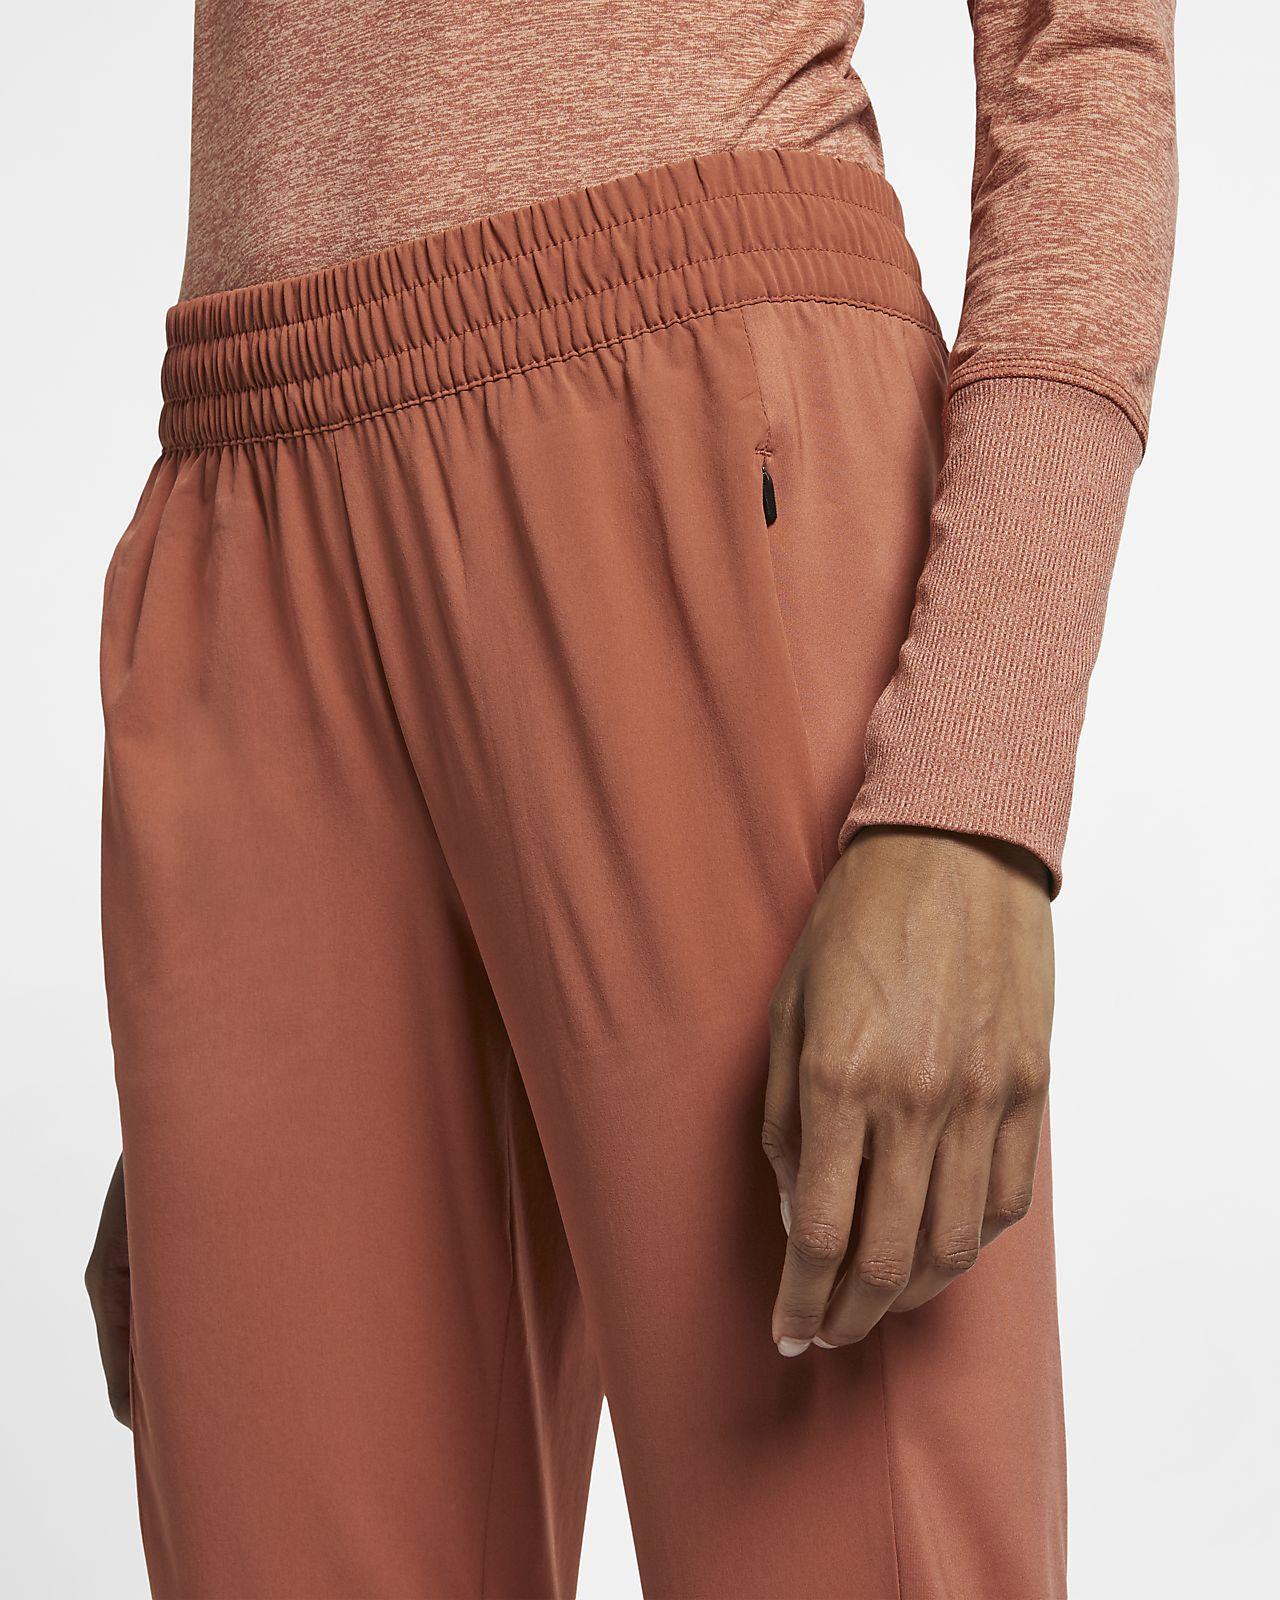 486f3f78260 Γυναικείο παντελόνι για τρέξιμο Nike Swift. Nike.com GR